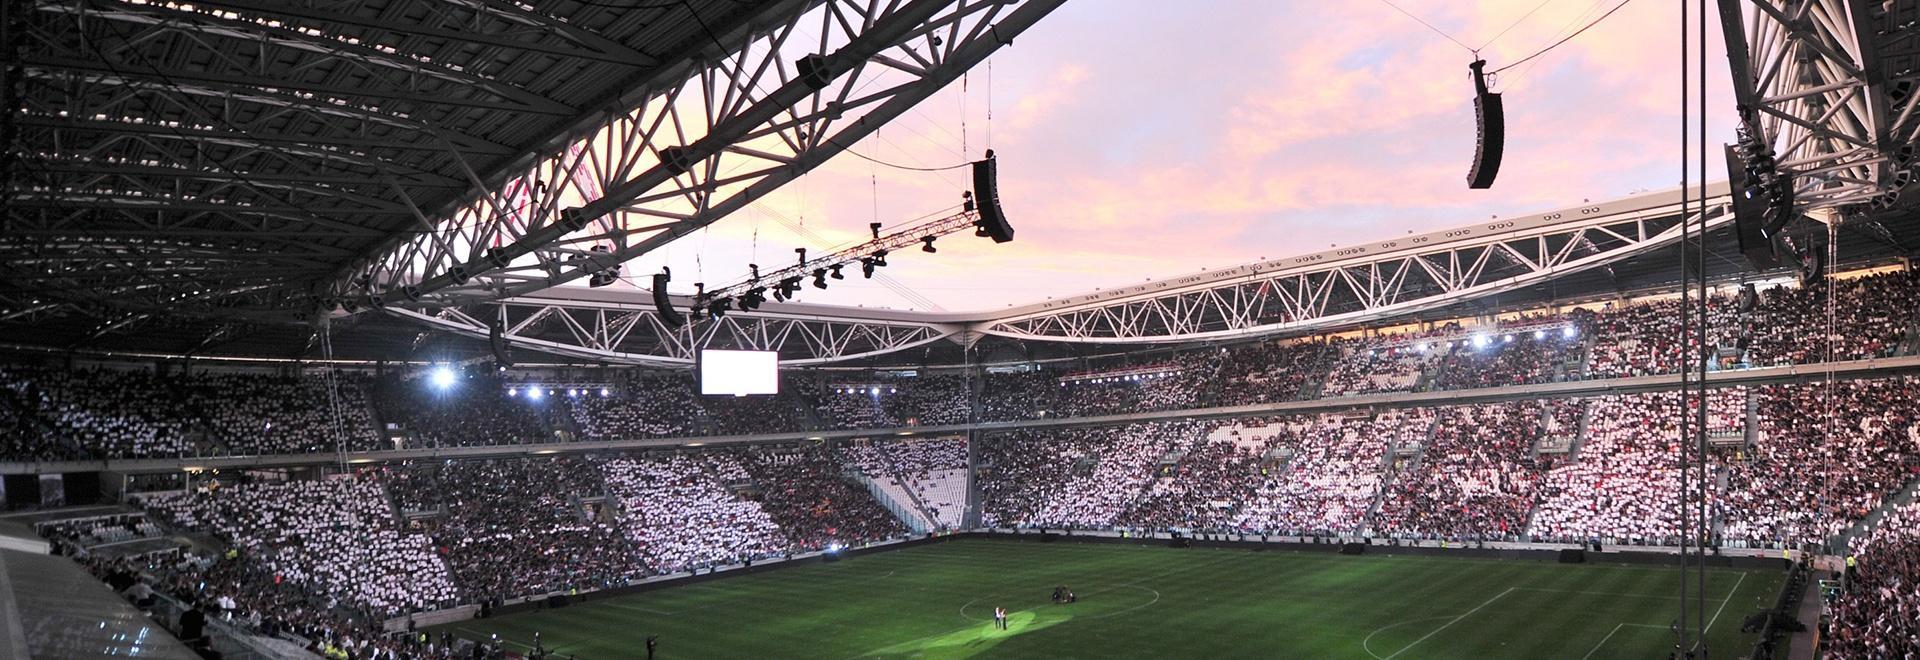 Juve vs Inter anni '80-'90